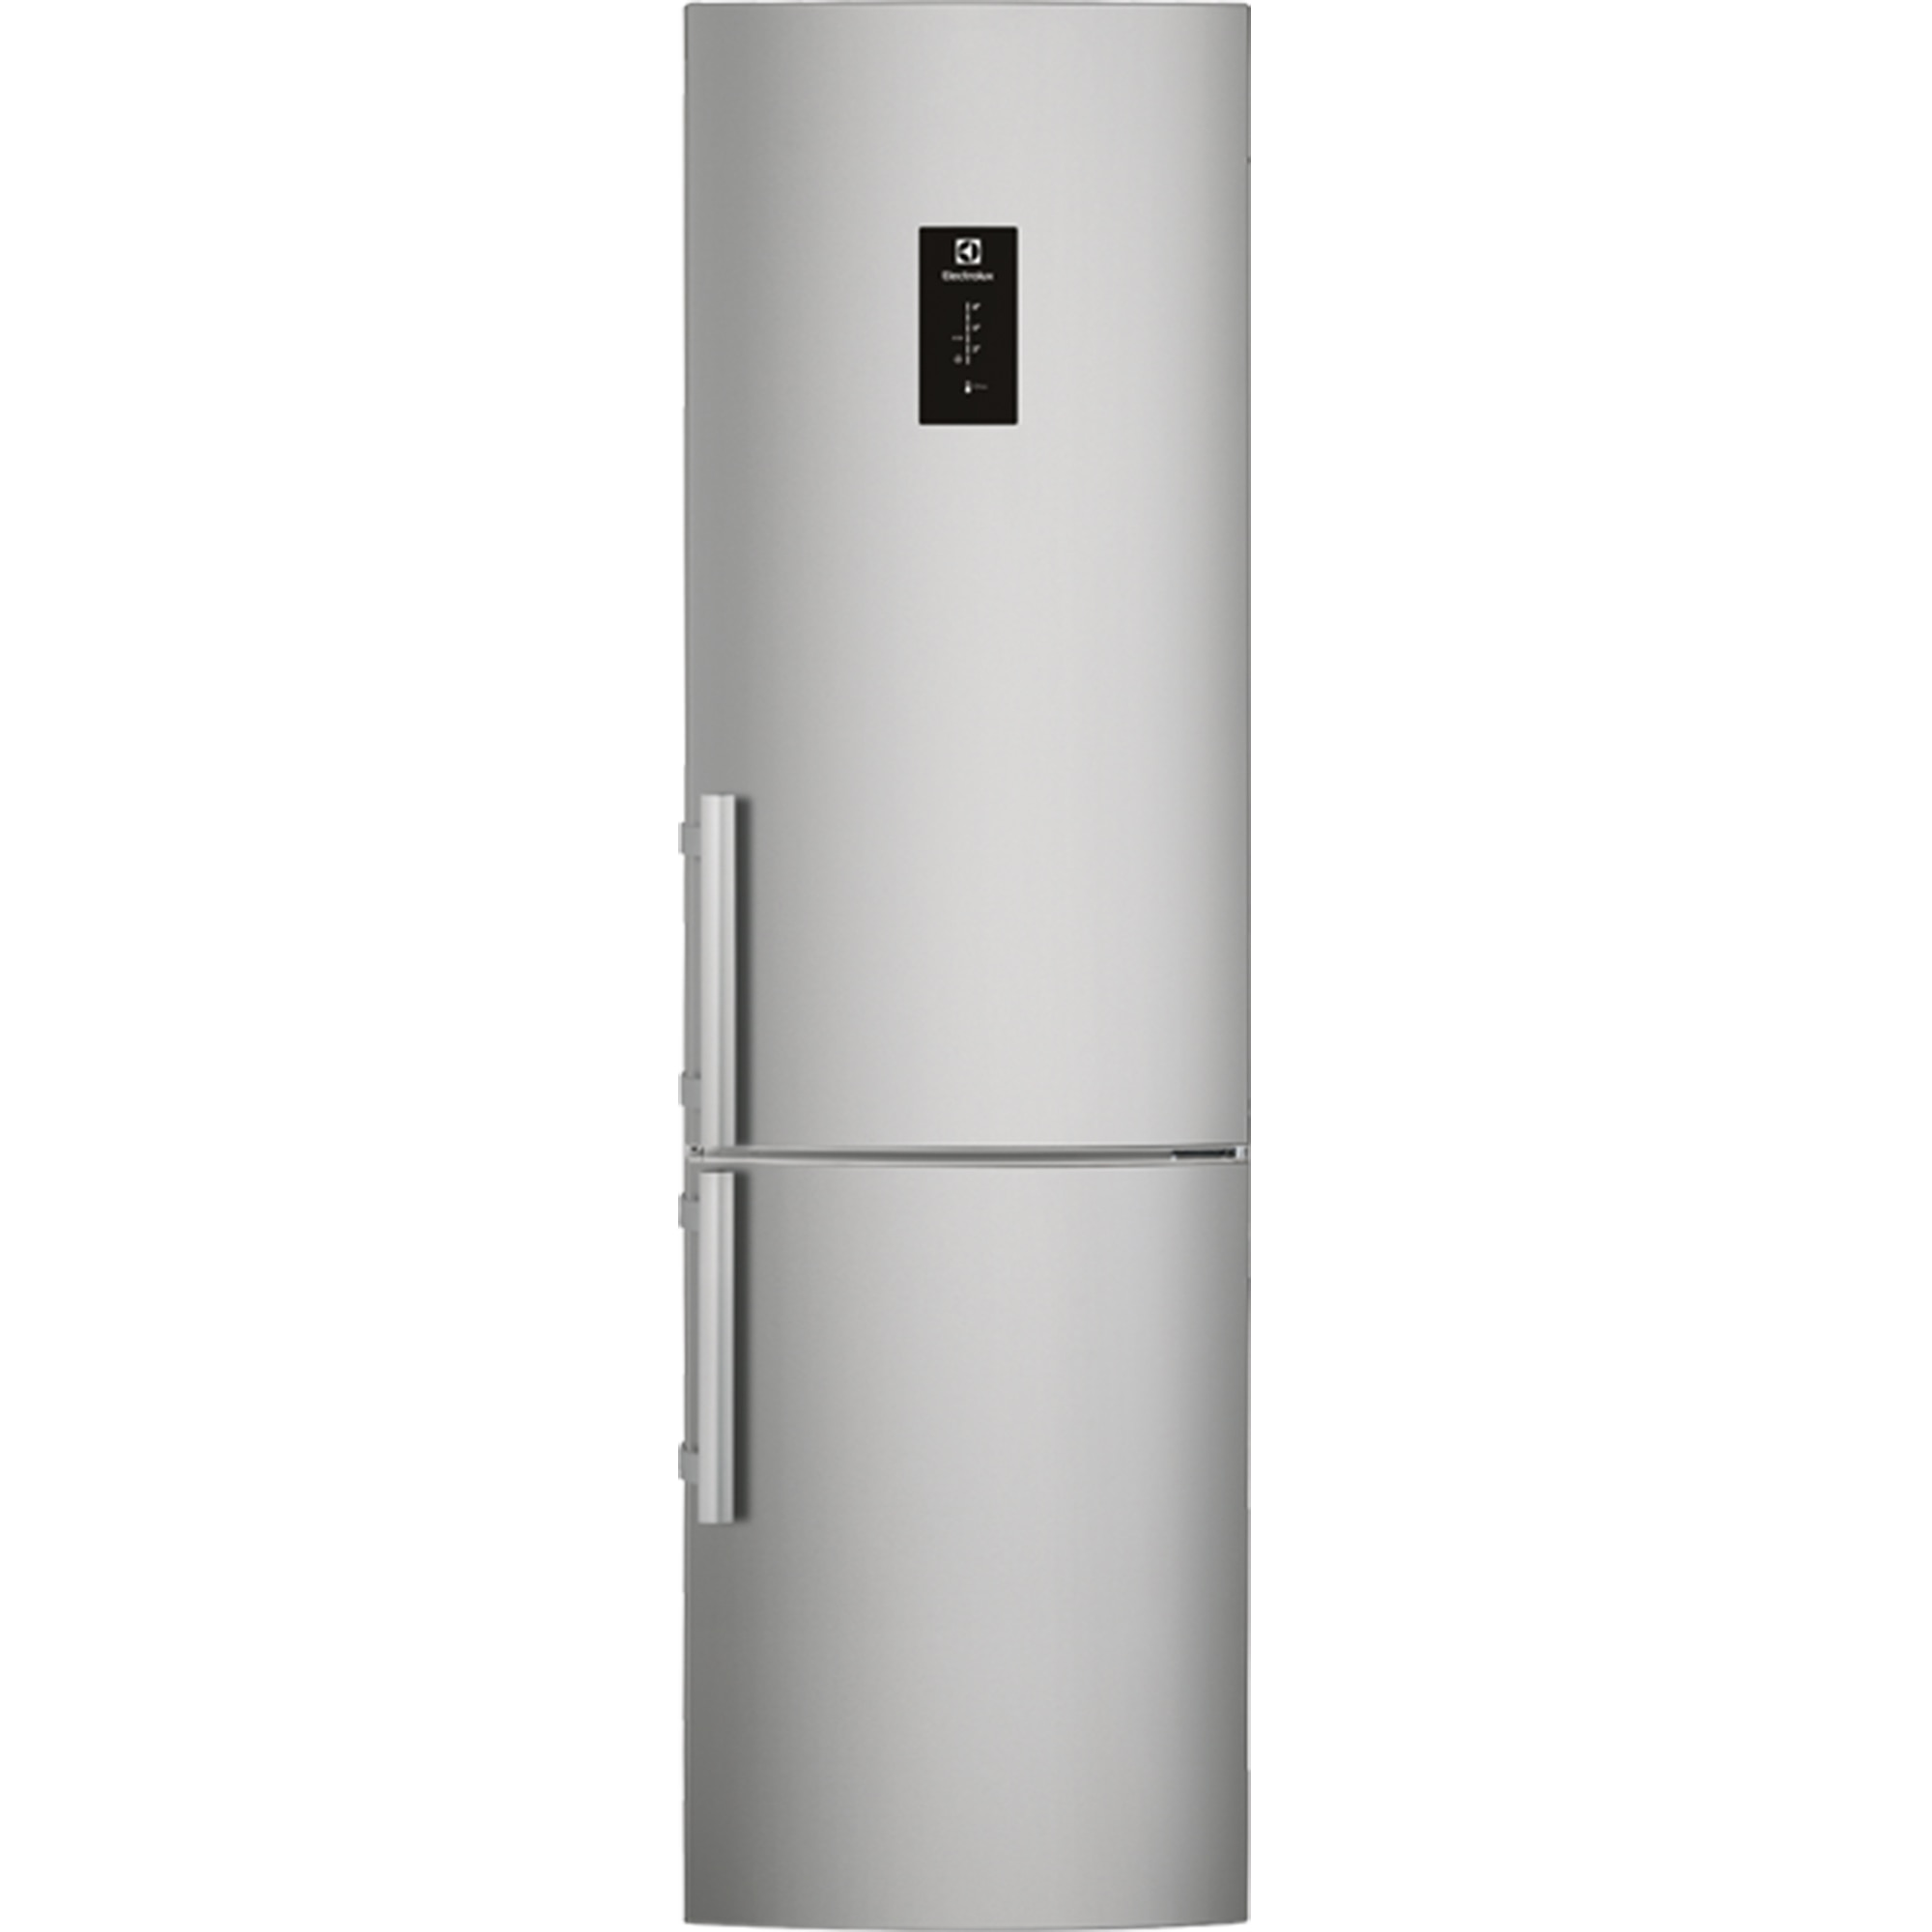 Fotografie Combina frigorifica ELECTROLUX EN3790MFX, 334 l,Clasa A++, No frost, Display LCD, H 200 cm, Inox antiamprenta